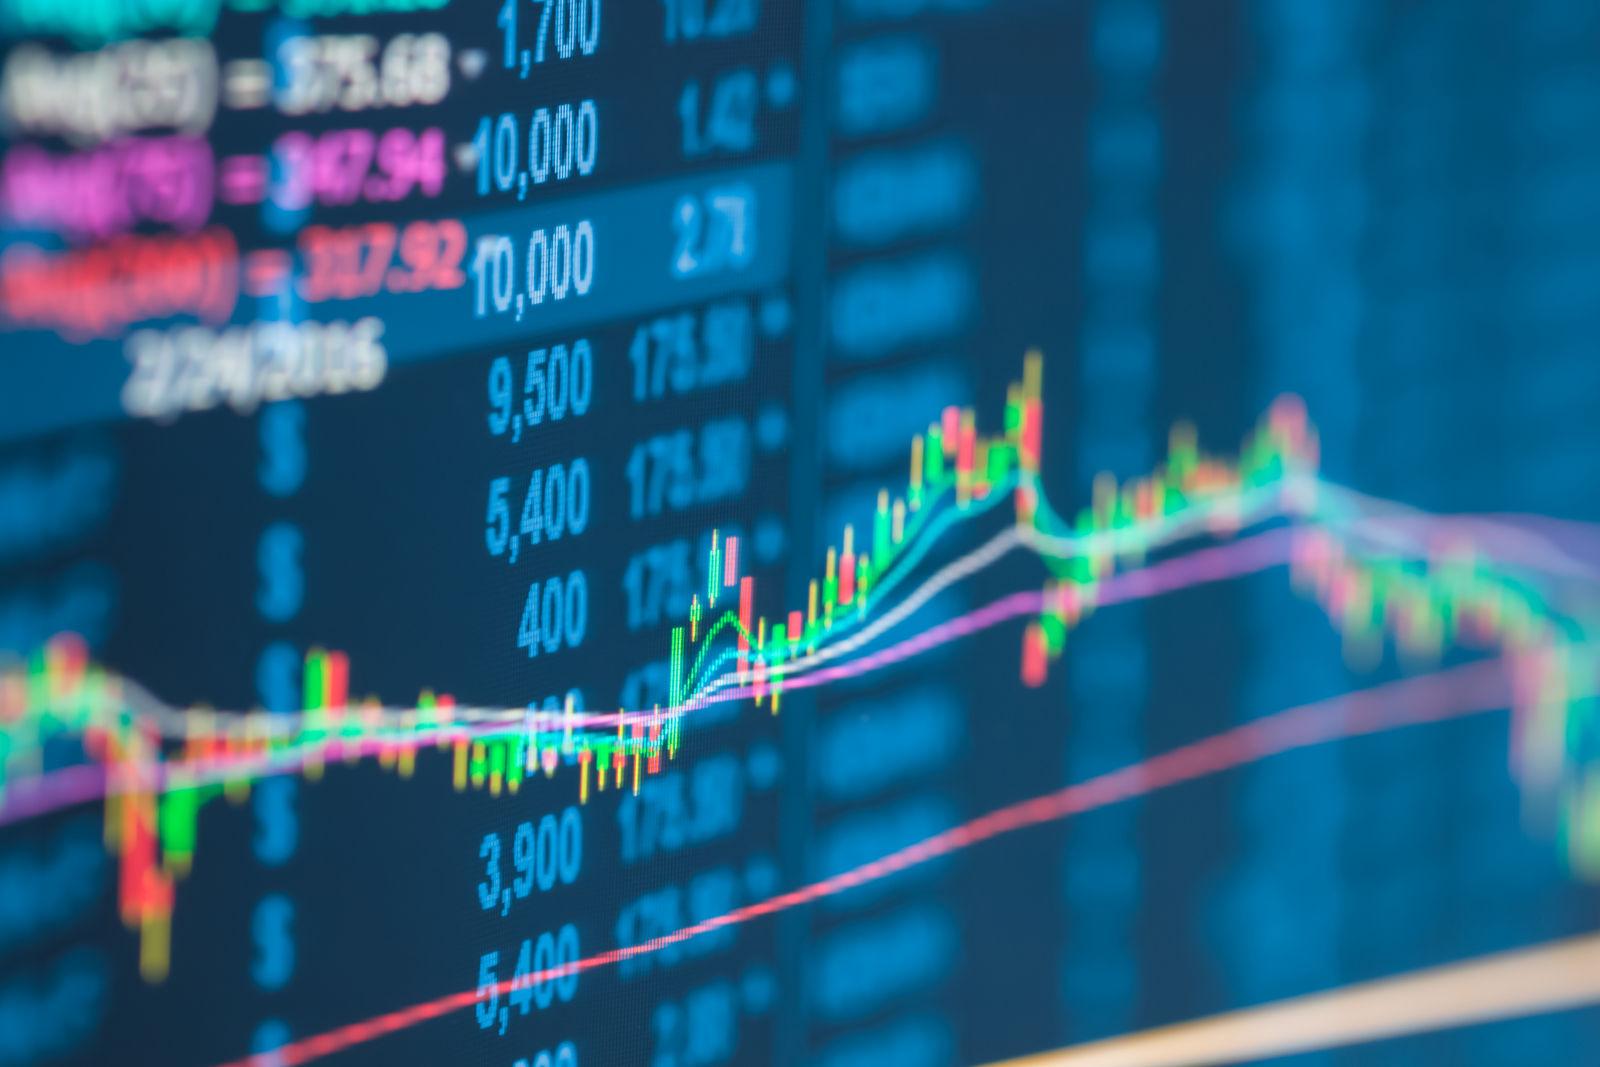 Dividend Growth Investing Exposed Investor Peek